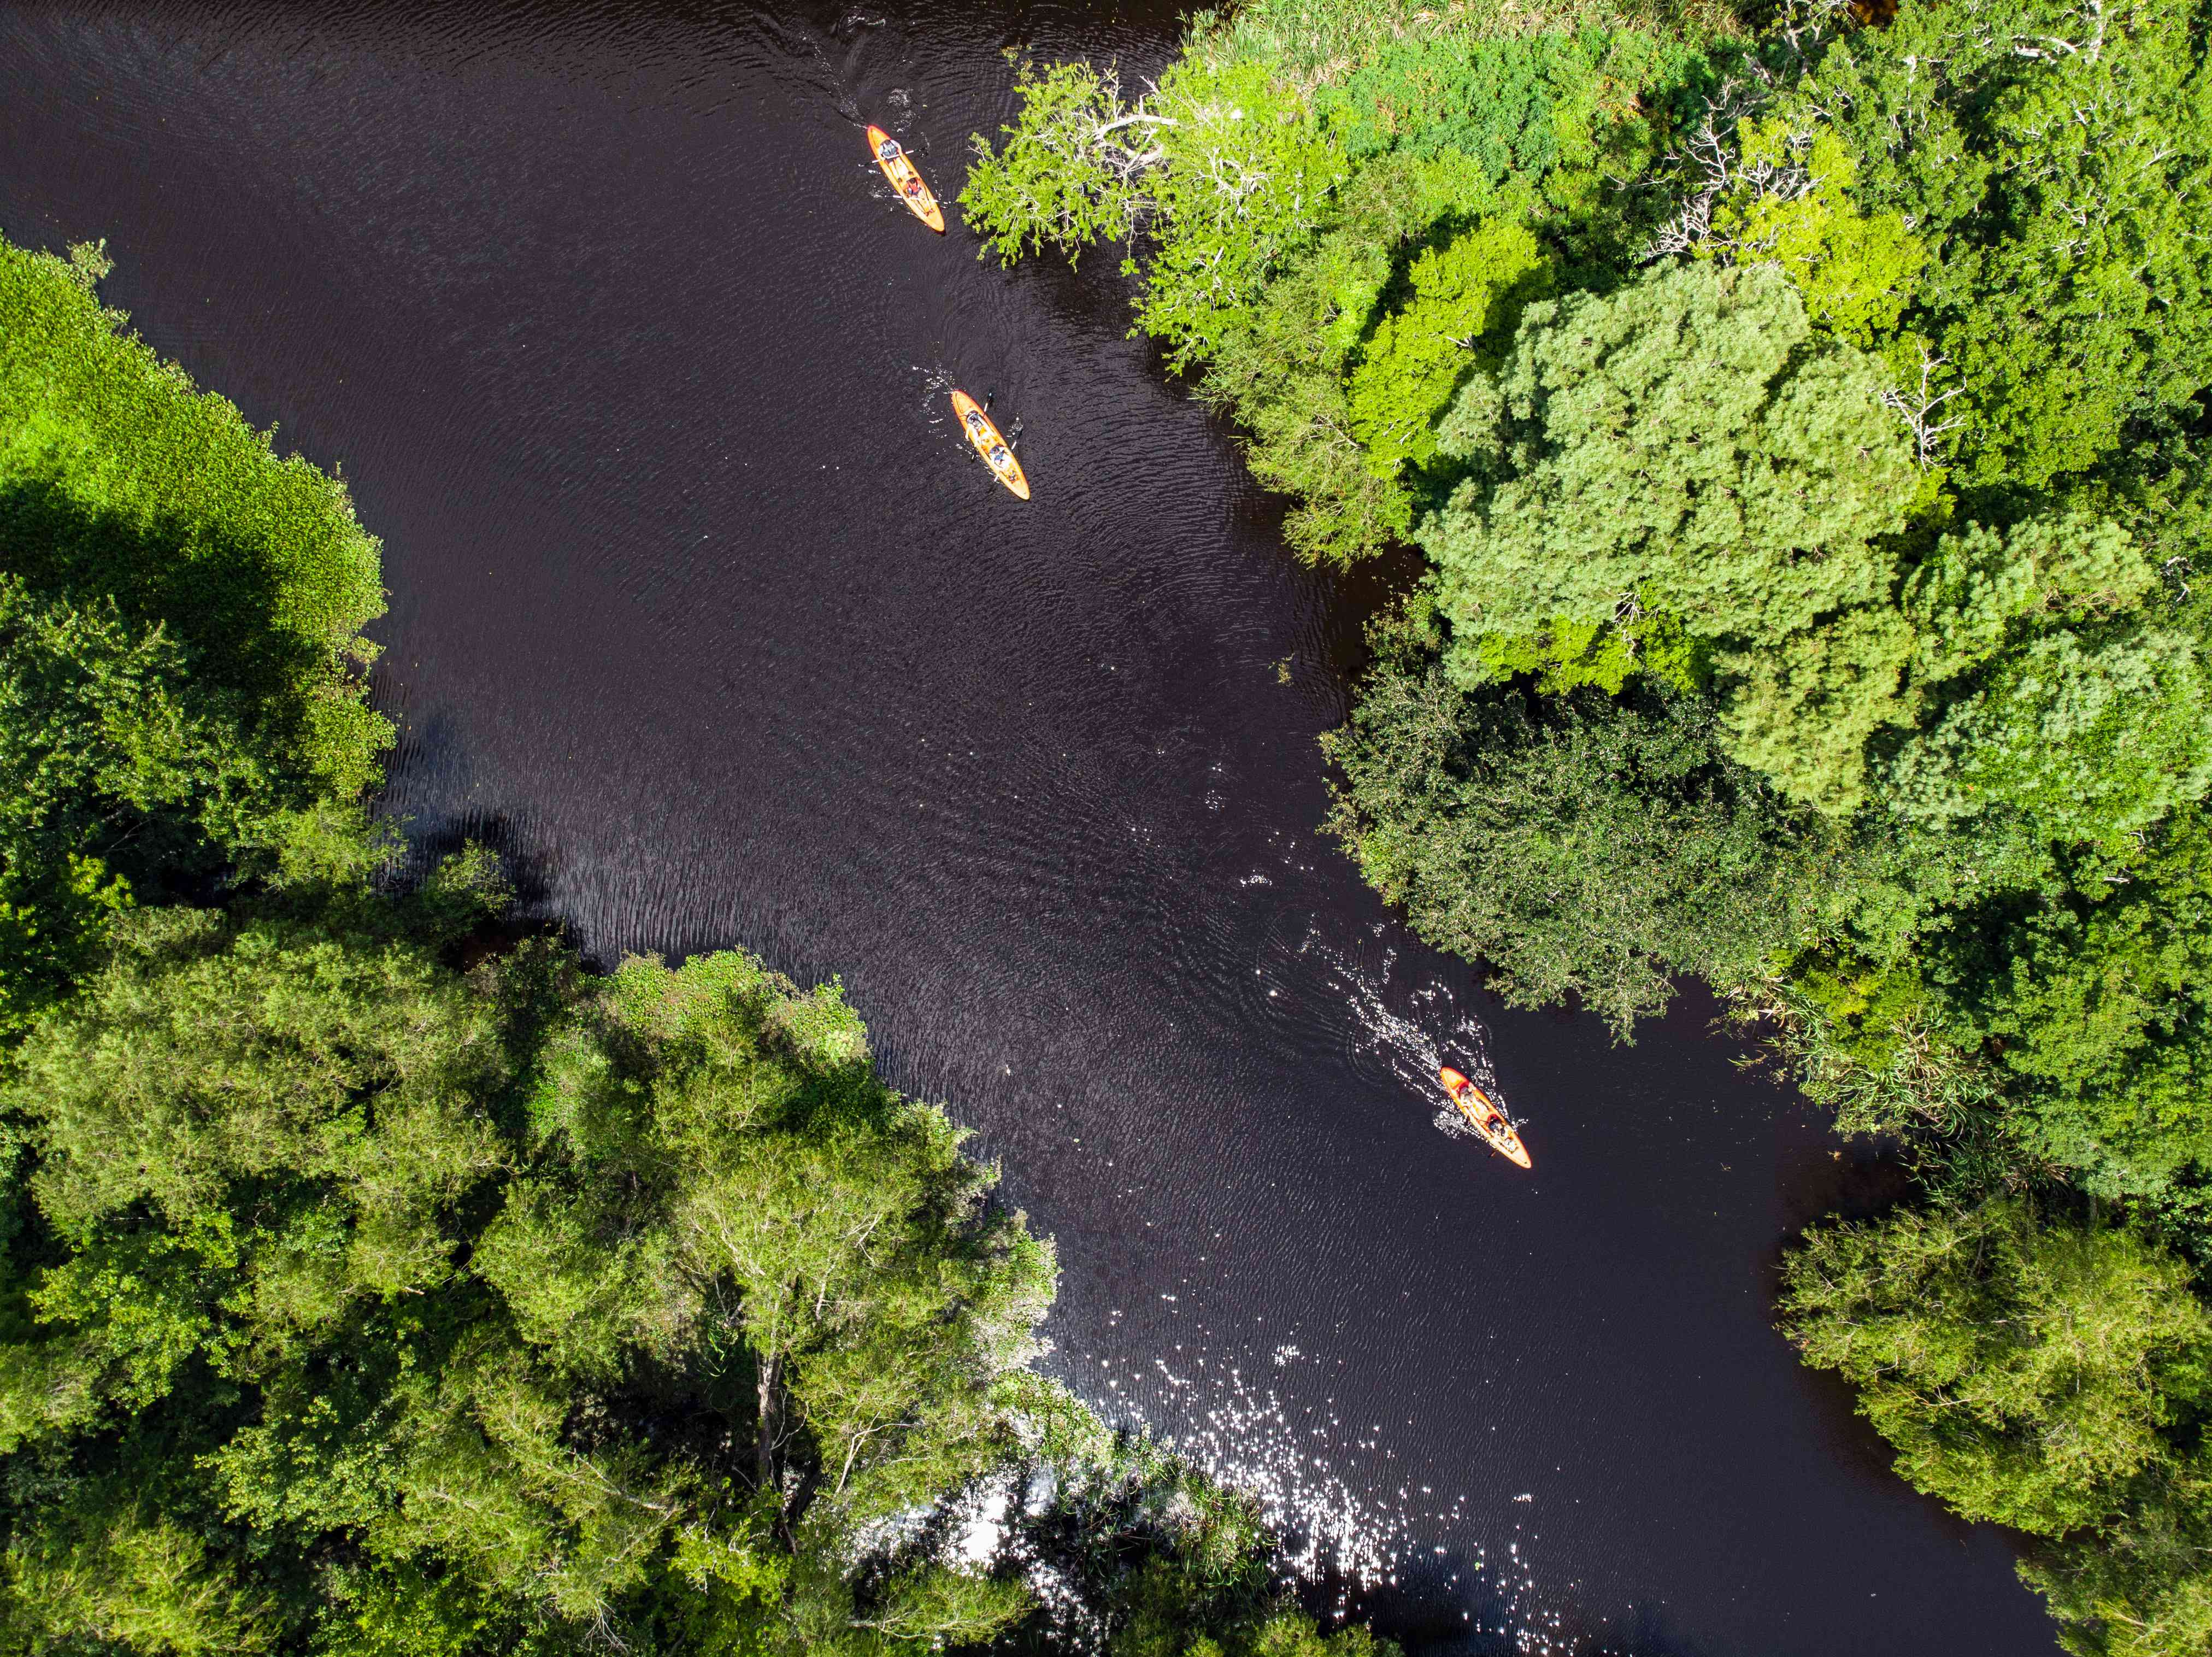 People kayaking down the bayou